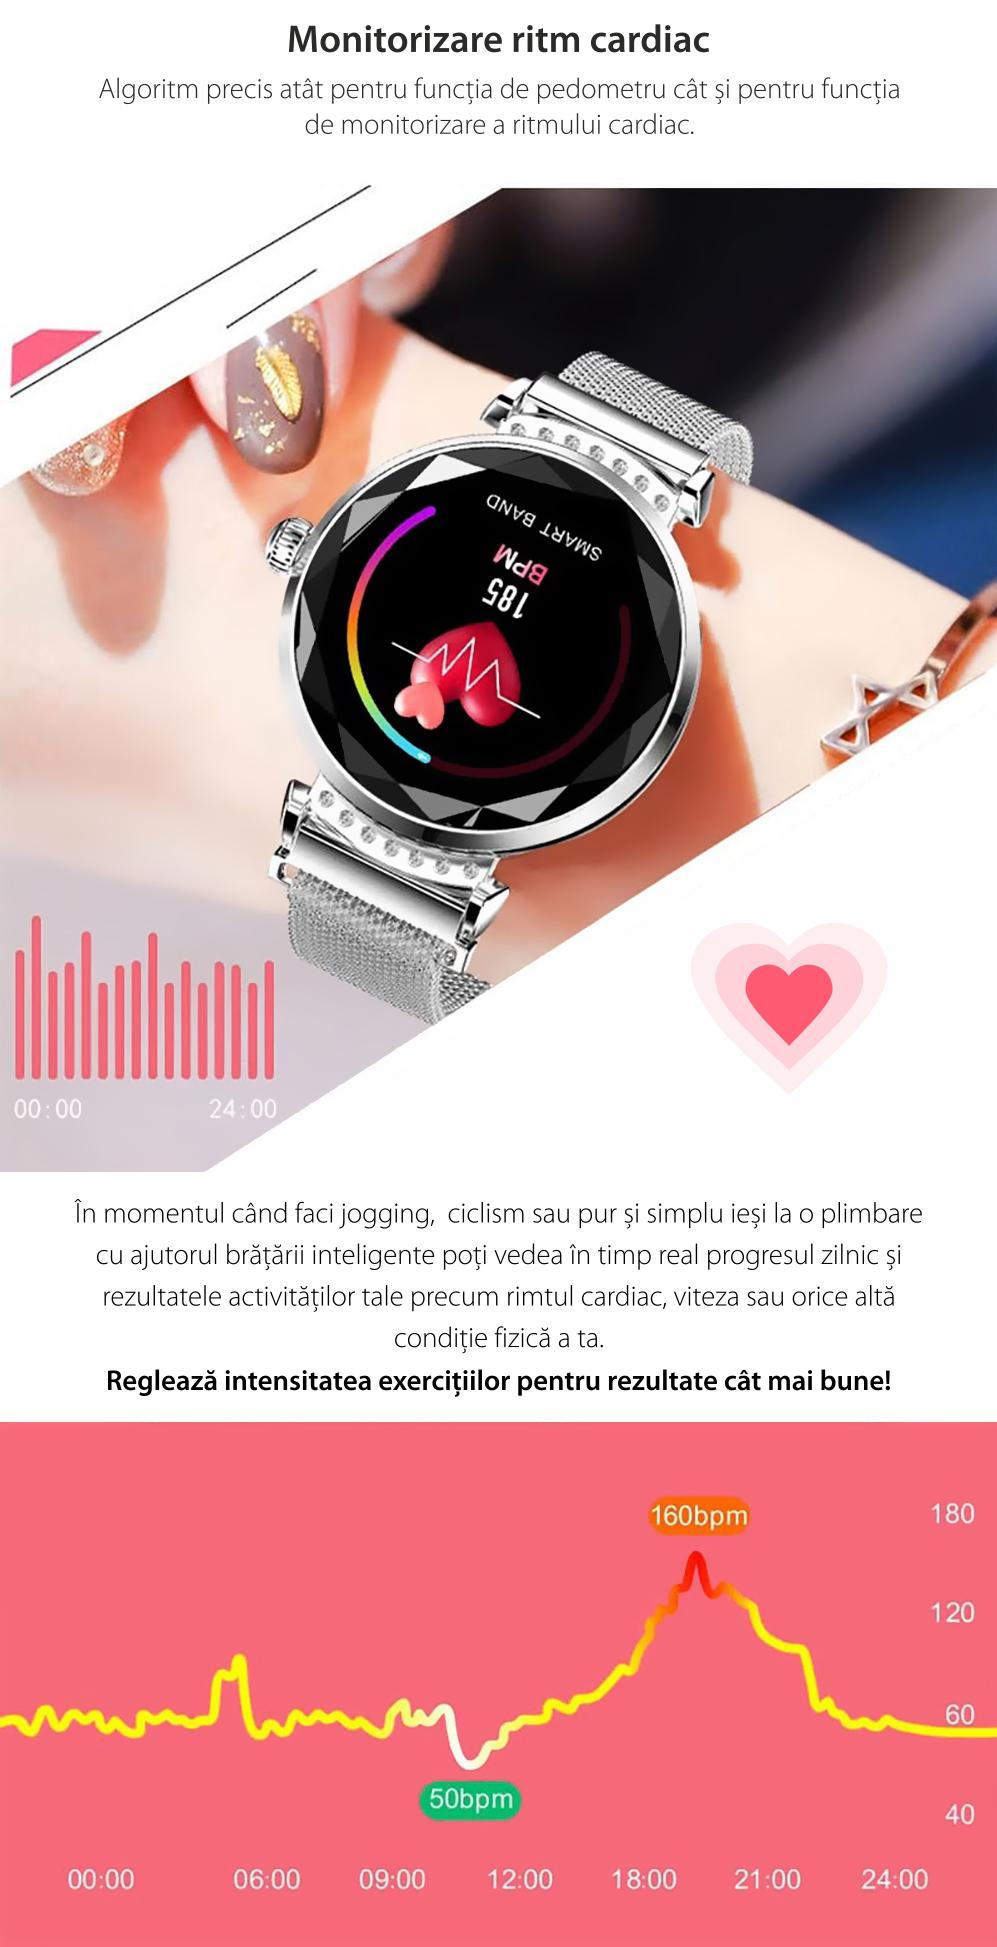 Ceas Smartwatch fitness fashion H2 cu functie de monitorizare ritm cardiac, Notificari, Pedometru, Bluetooth, Metal, Mov